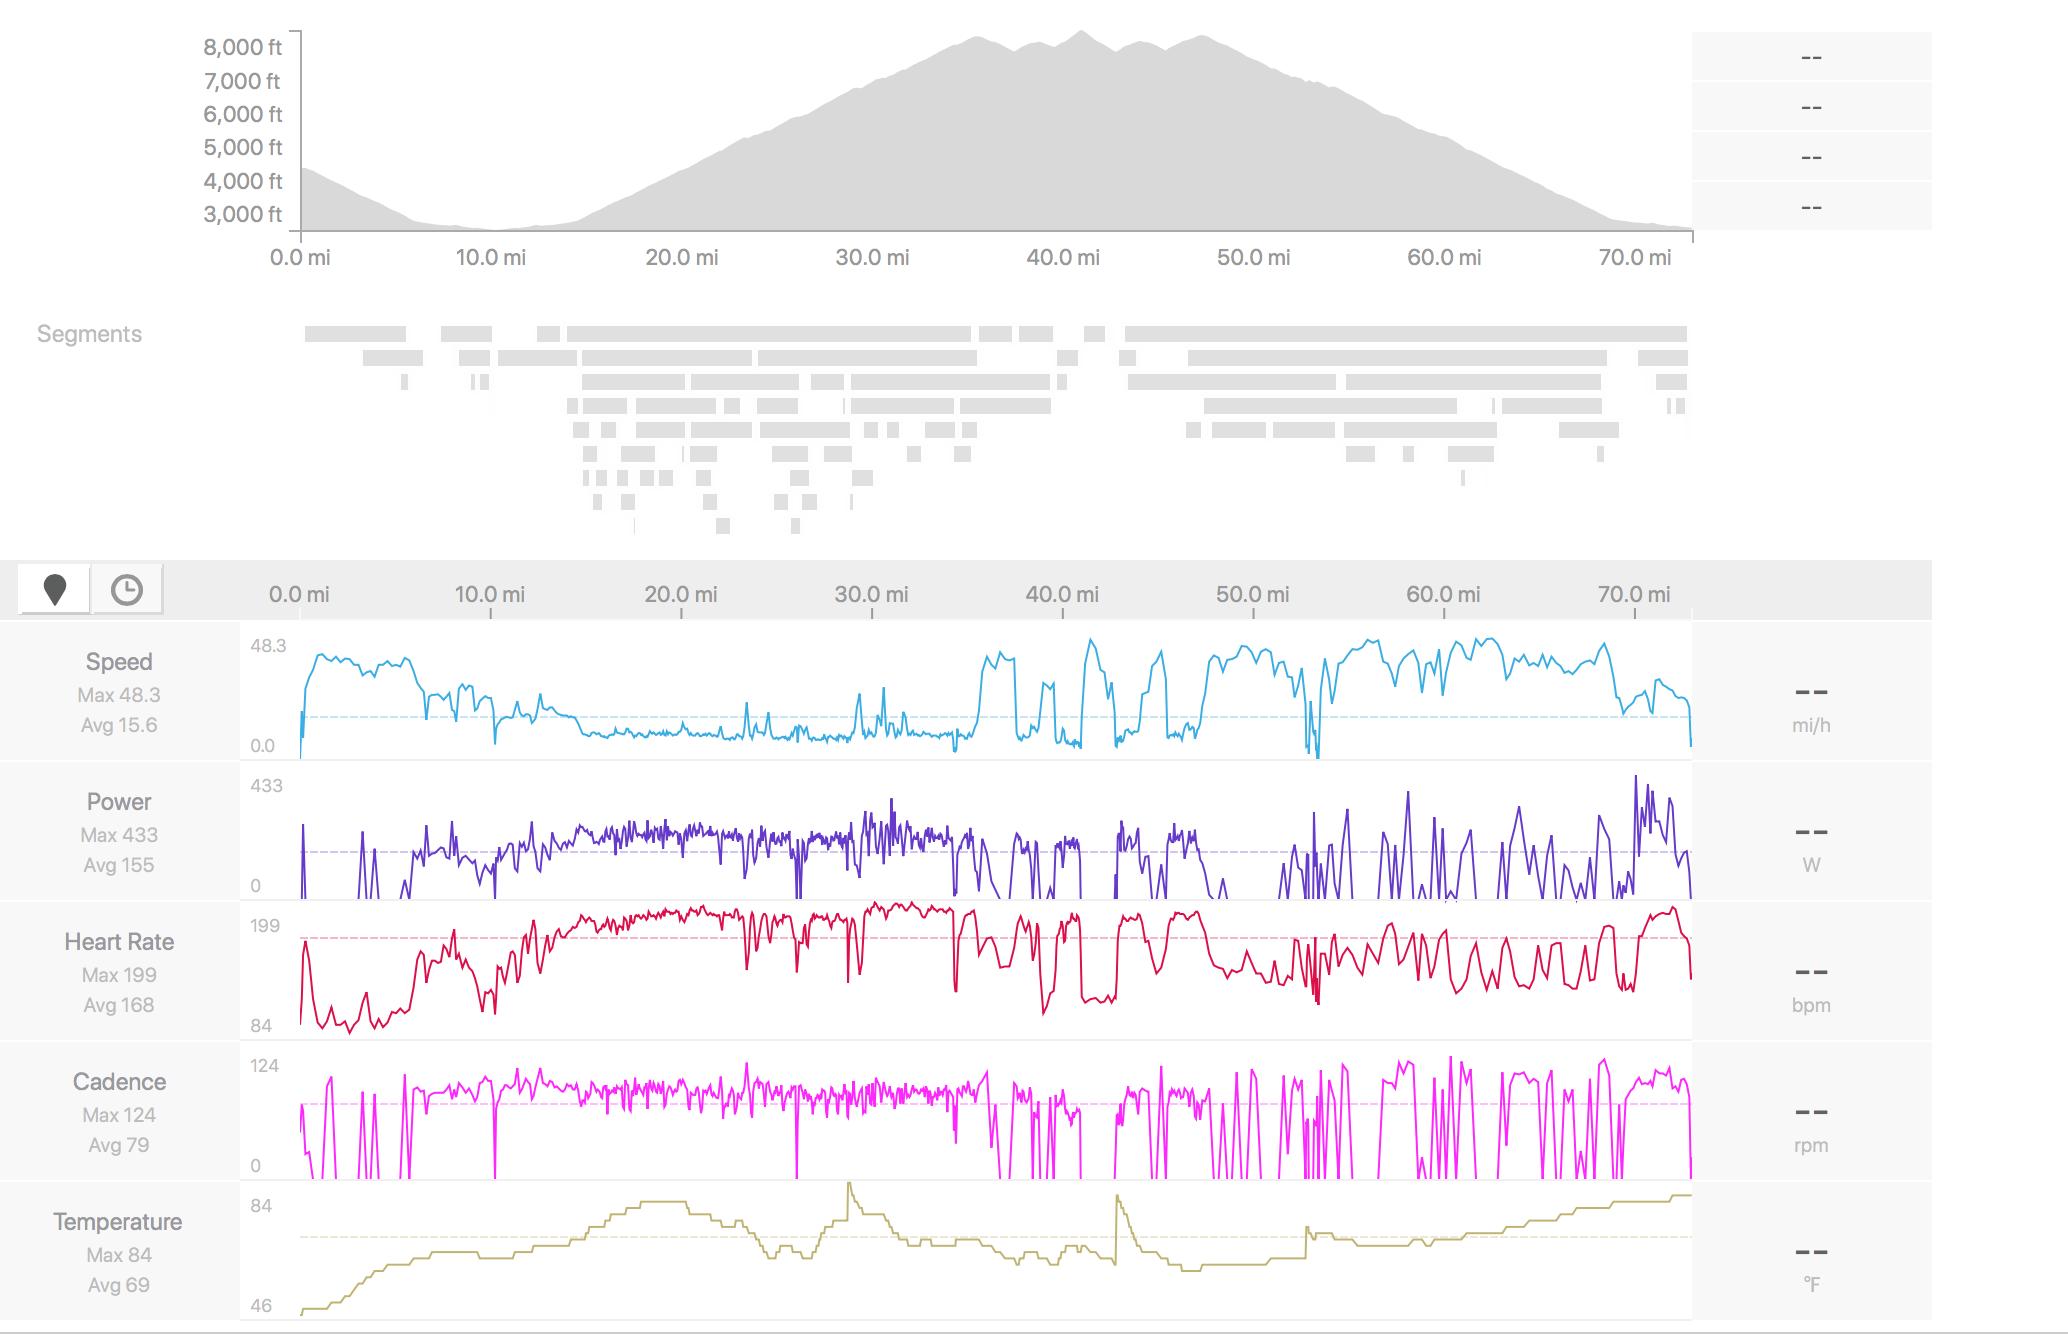 Strava graphs Mt Lemmon